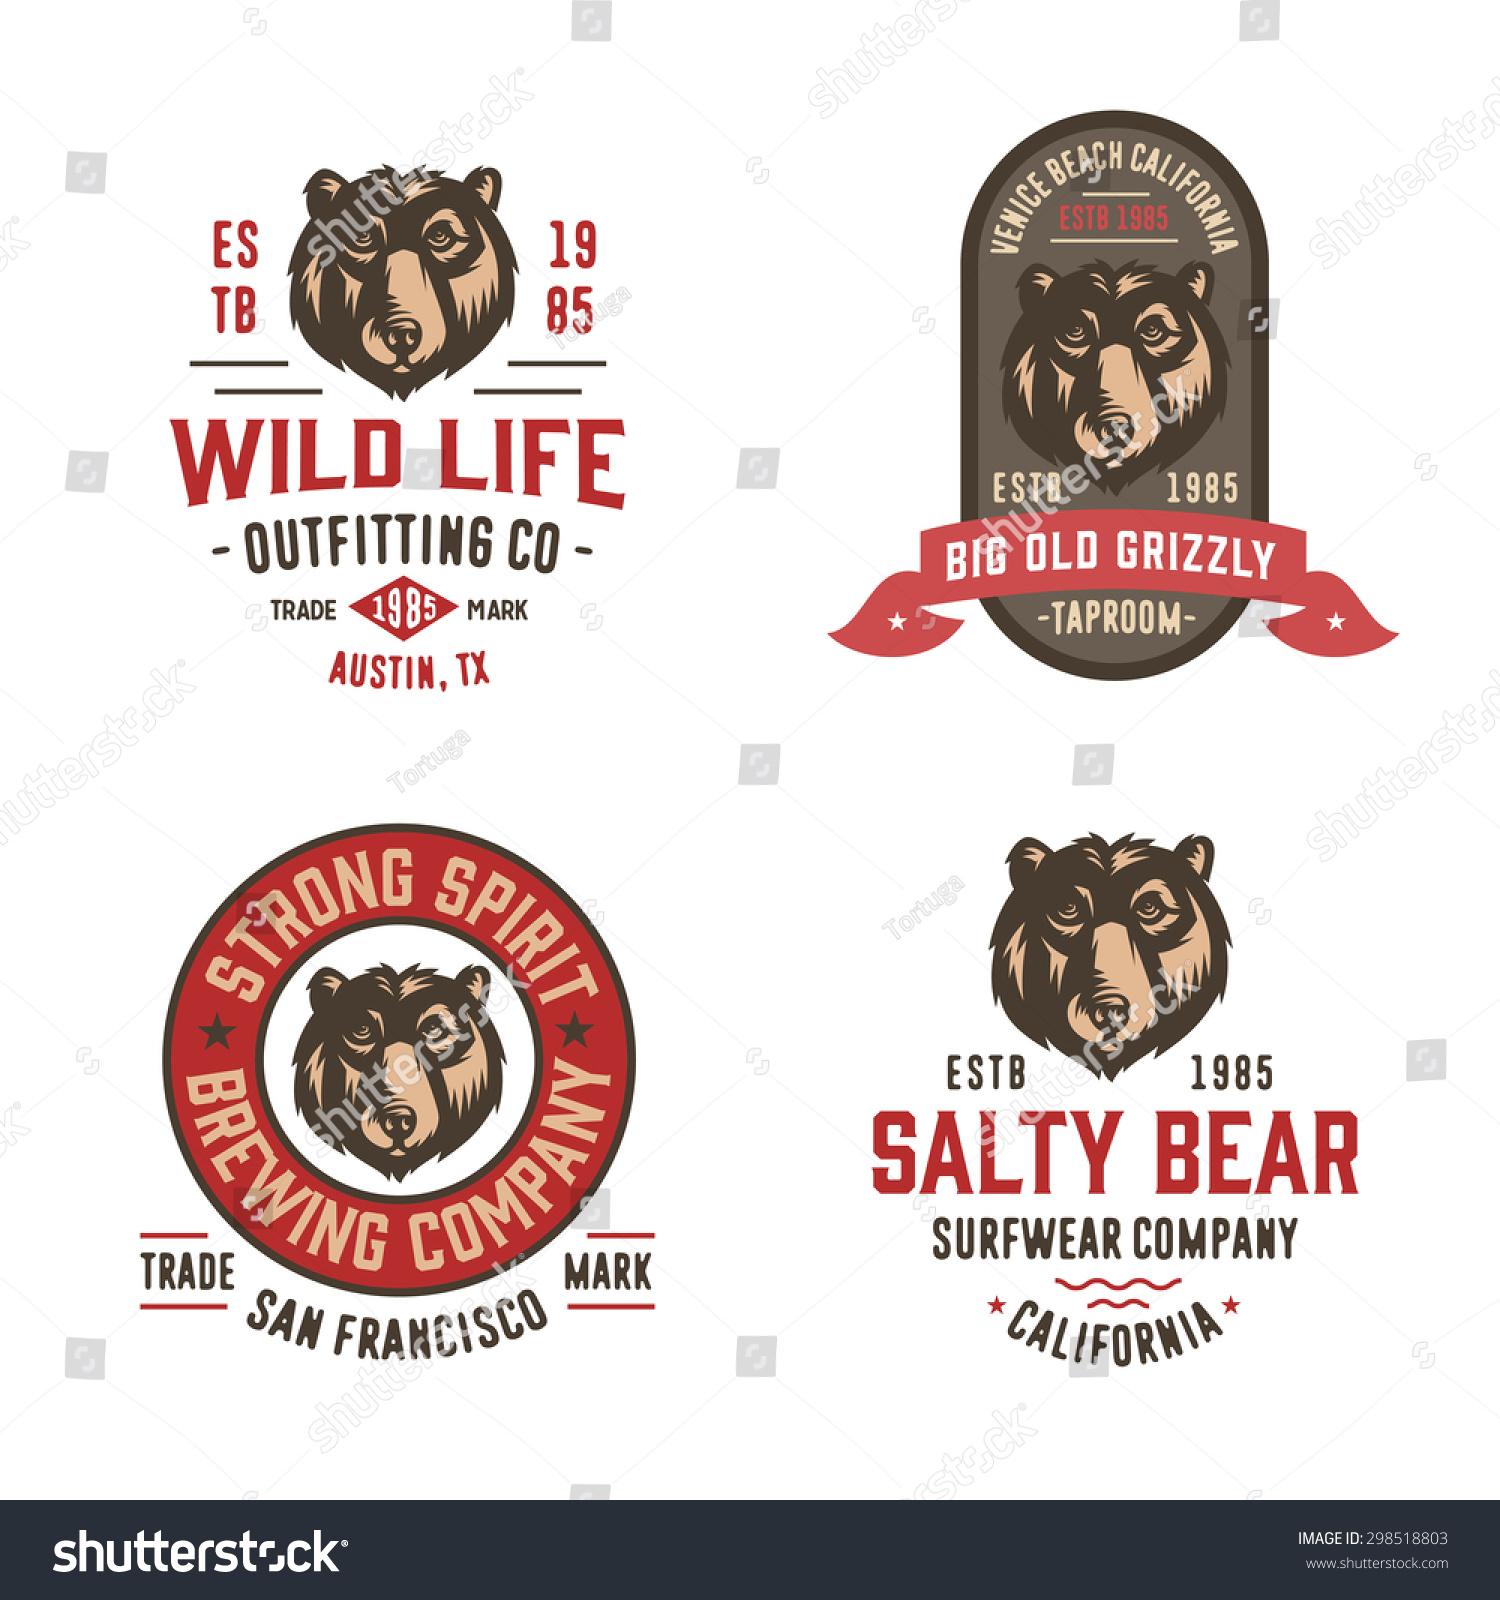 Set Of Badges Labels Logo Design Elements Collection Quality Vintage Emblems T Shirt Apparel Graphics Premium Retro Americana Style Symbols